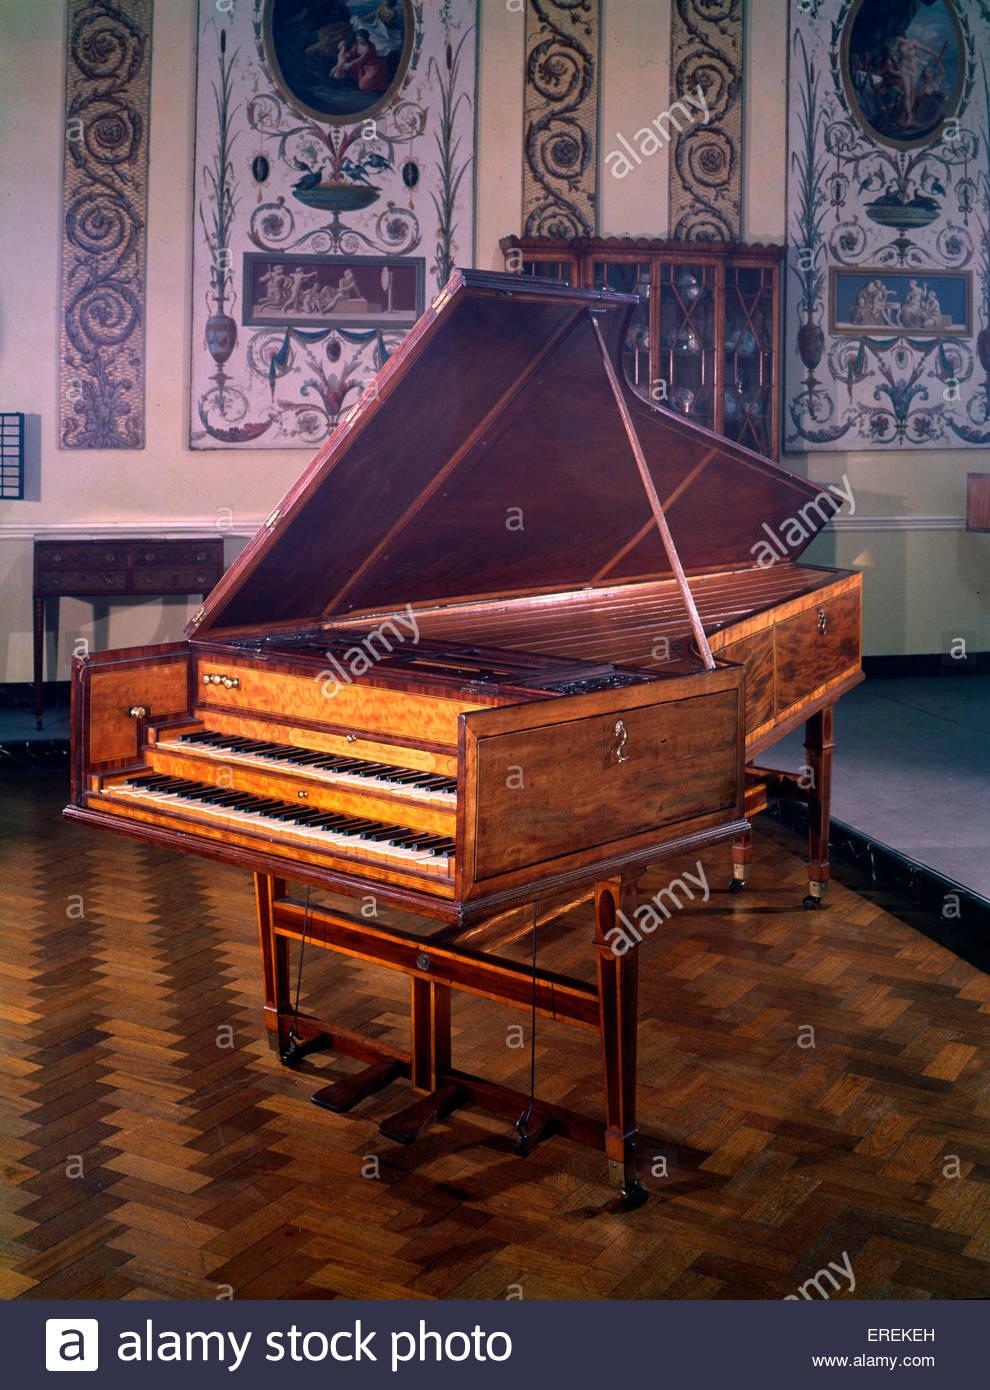 Il clavicembalo, fatta da Shudi (Tschudi) & Broadwood, Inghilterra, 1782. (V & A Museum di Londra). Immagini Stock